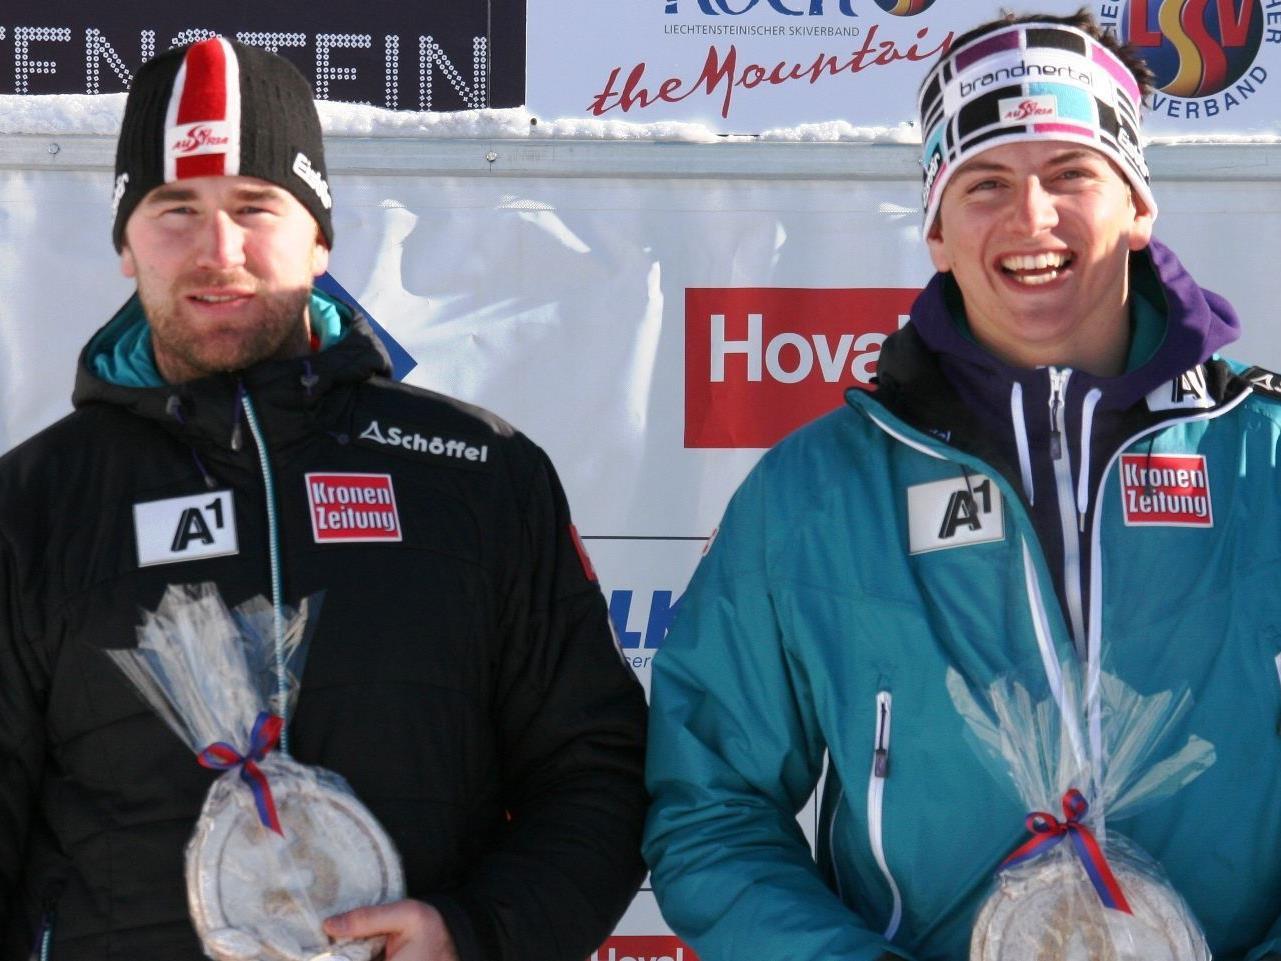 Patrick Bechter wurde Dritter, Frederic Berthold belegte den vierten Platz.